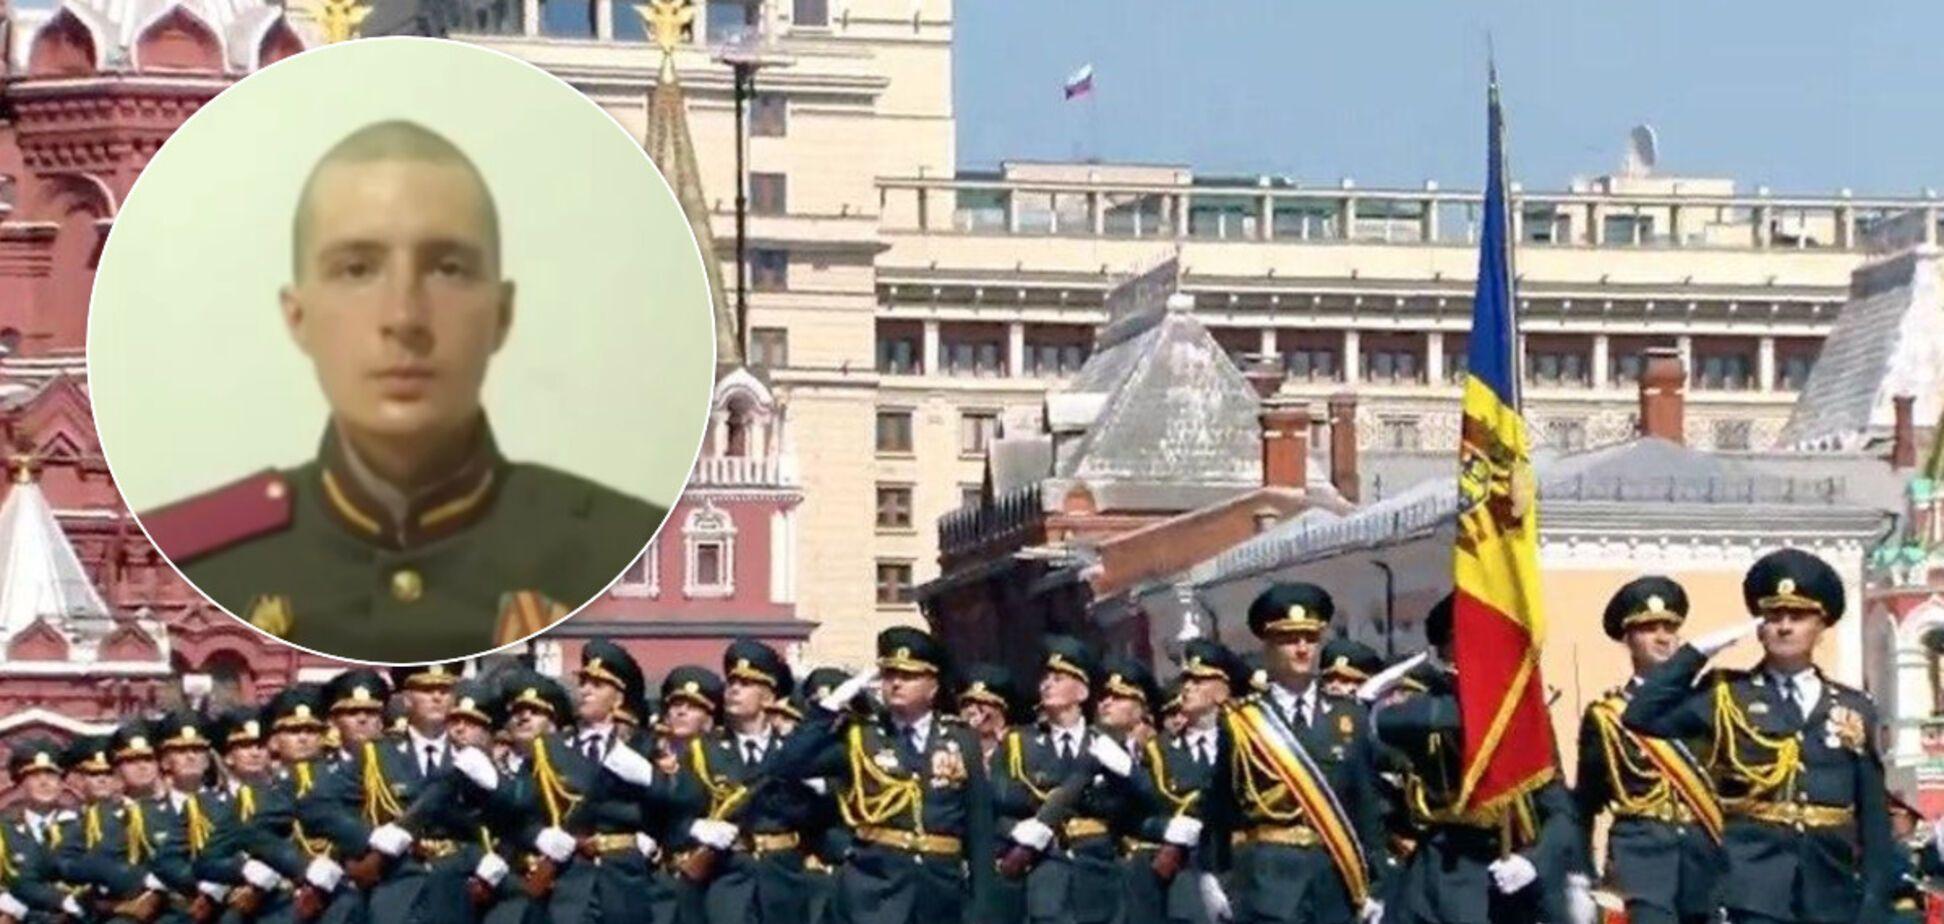 На параде Победы солдат разбил окно машины ФСО